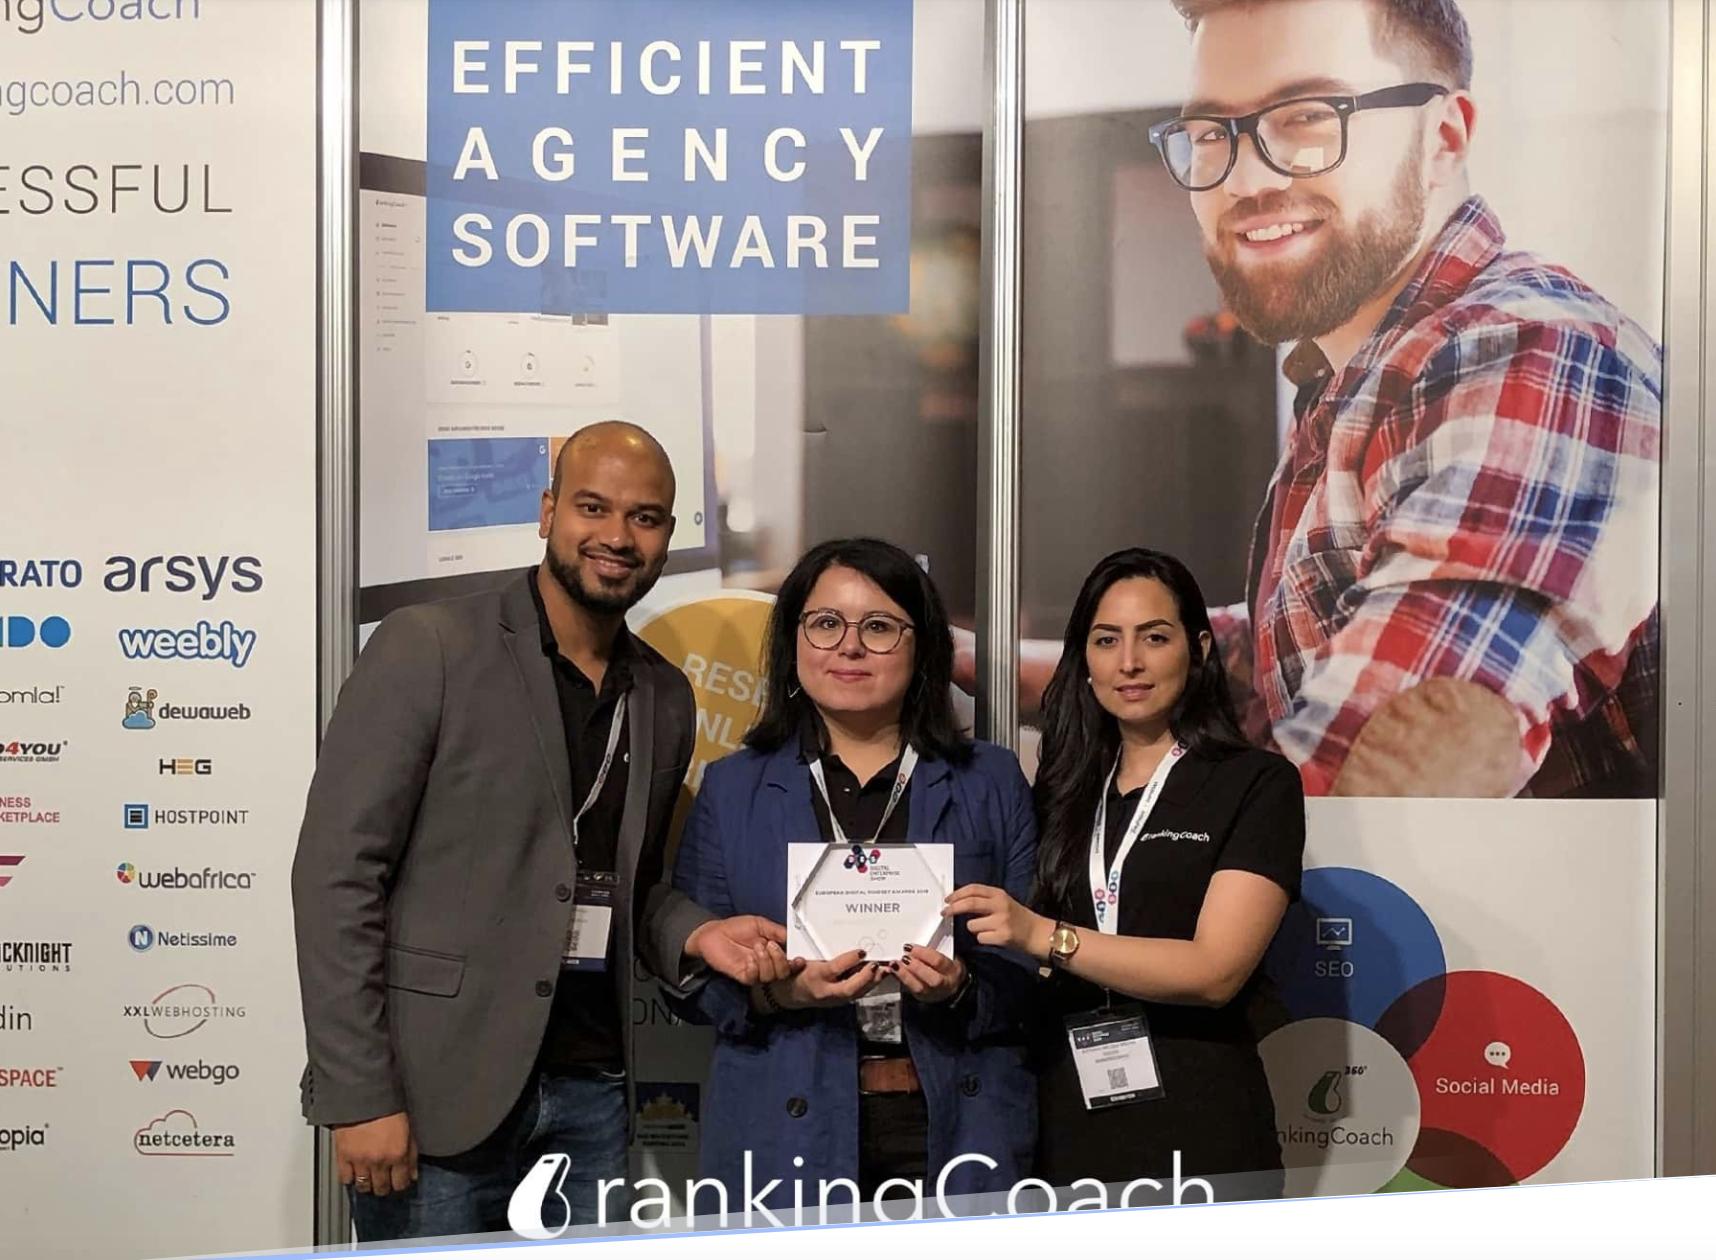 rankingCoach Wins Best Marketing Innovation 2019